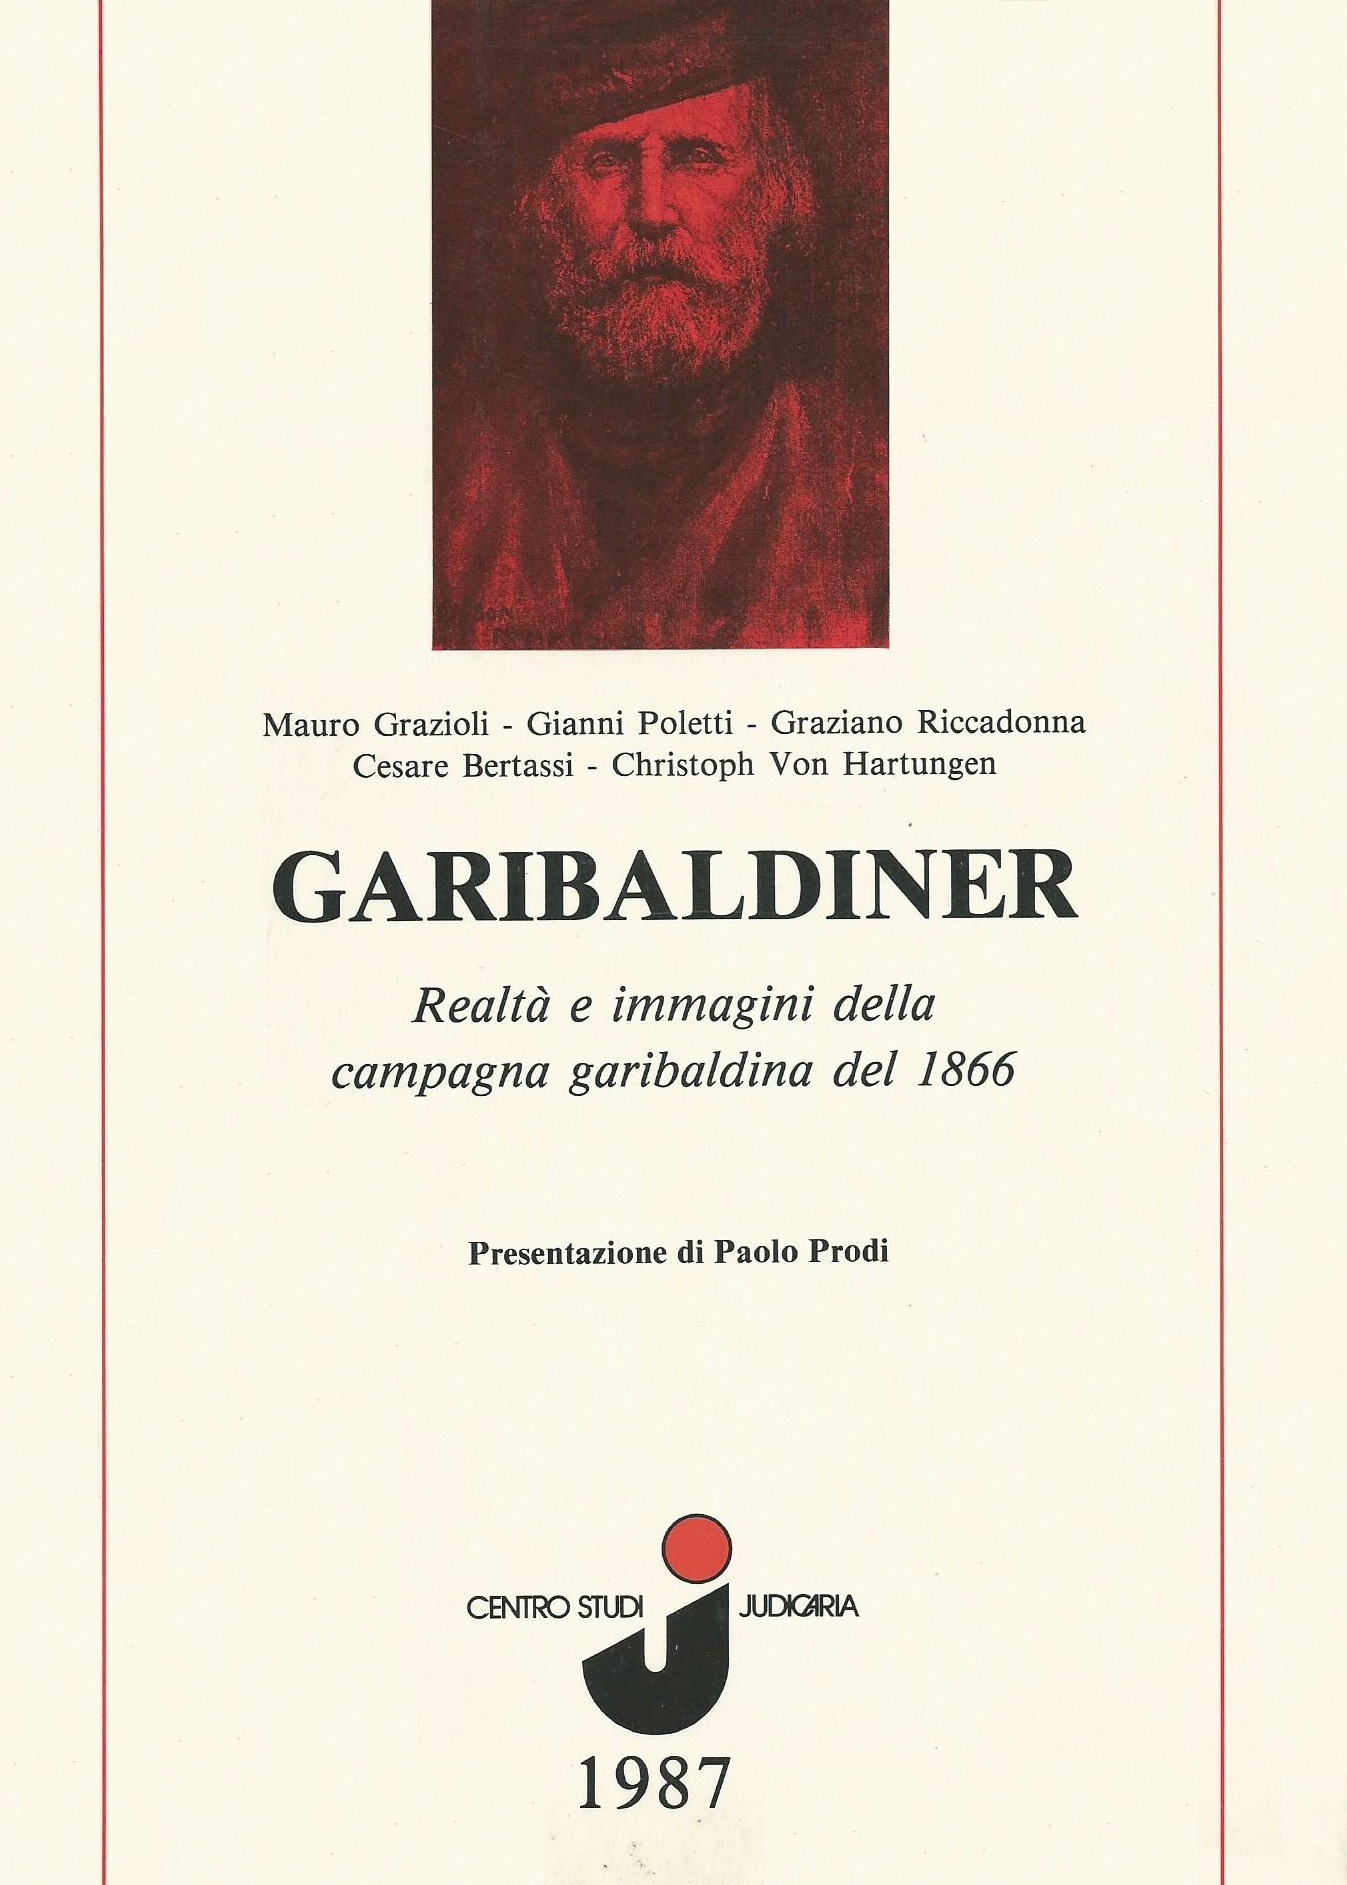 Garibaldiner